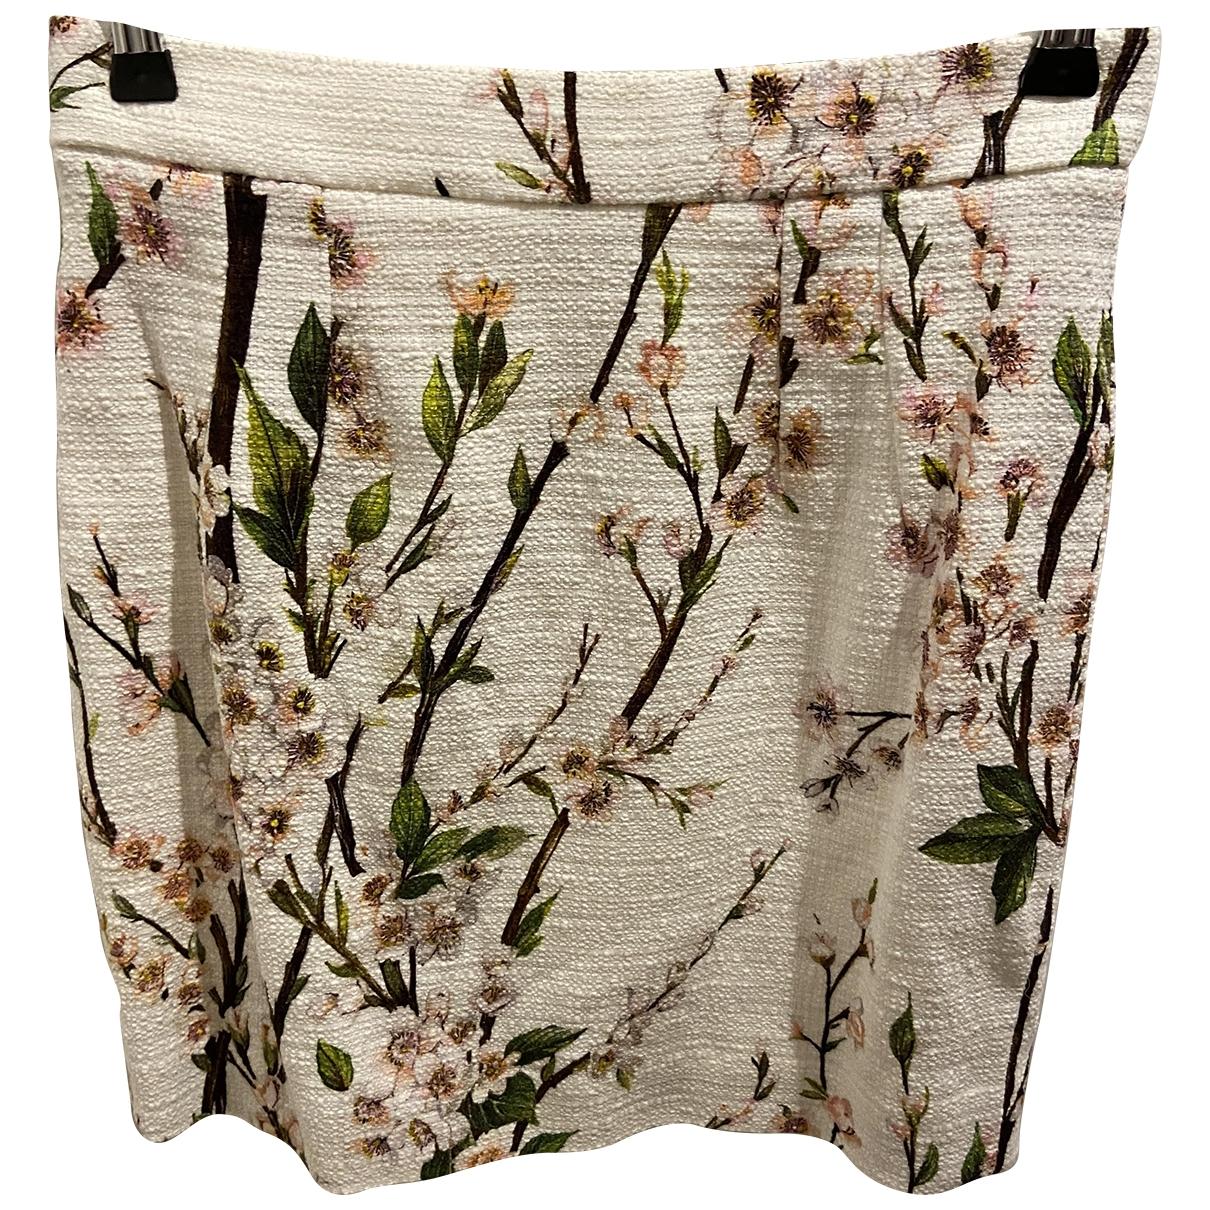 Dolce & Gabbana \N White Tweed skirt for Women 40 IT